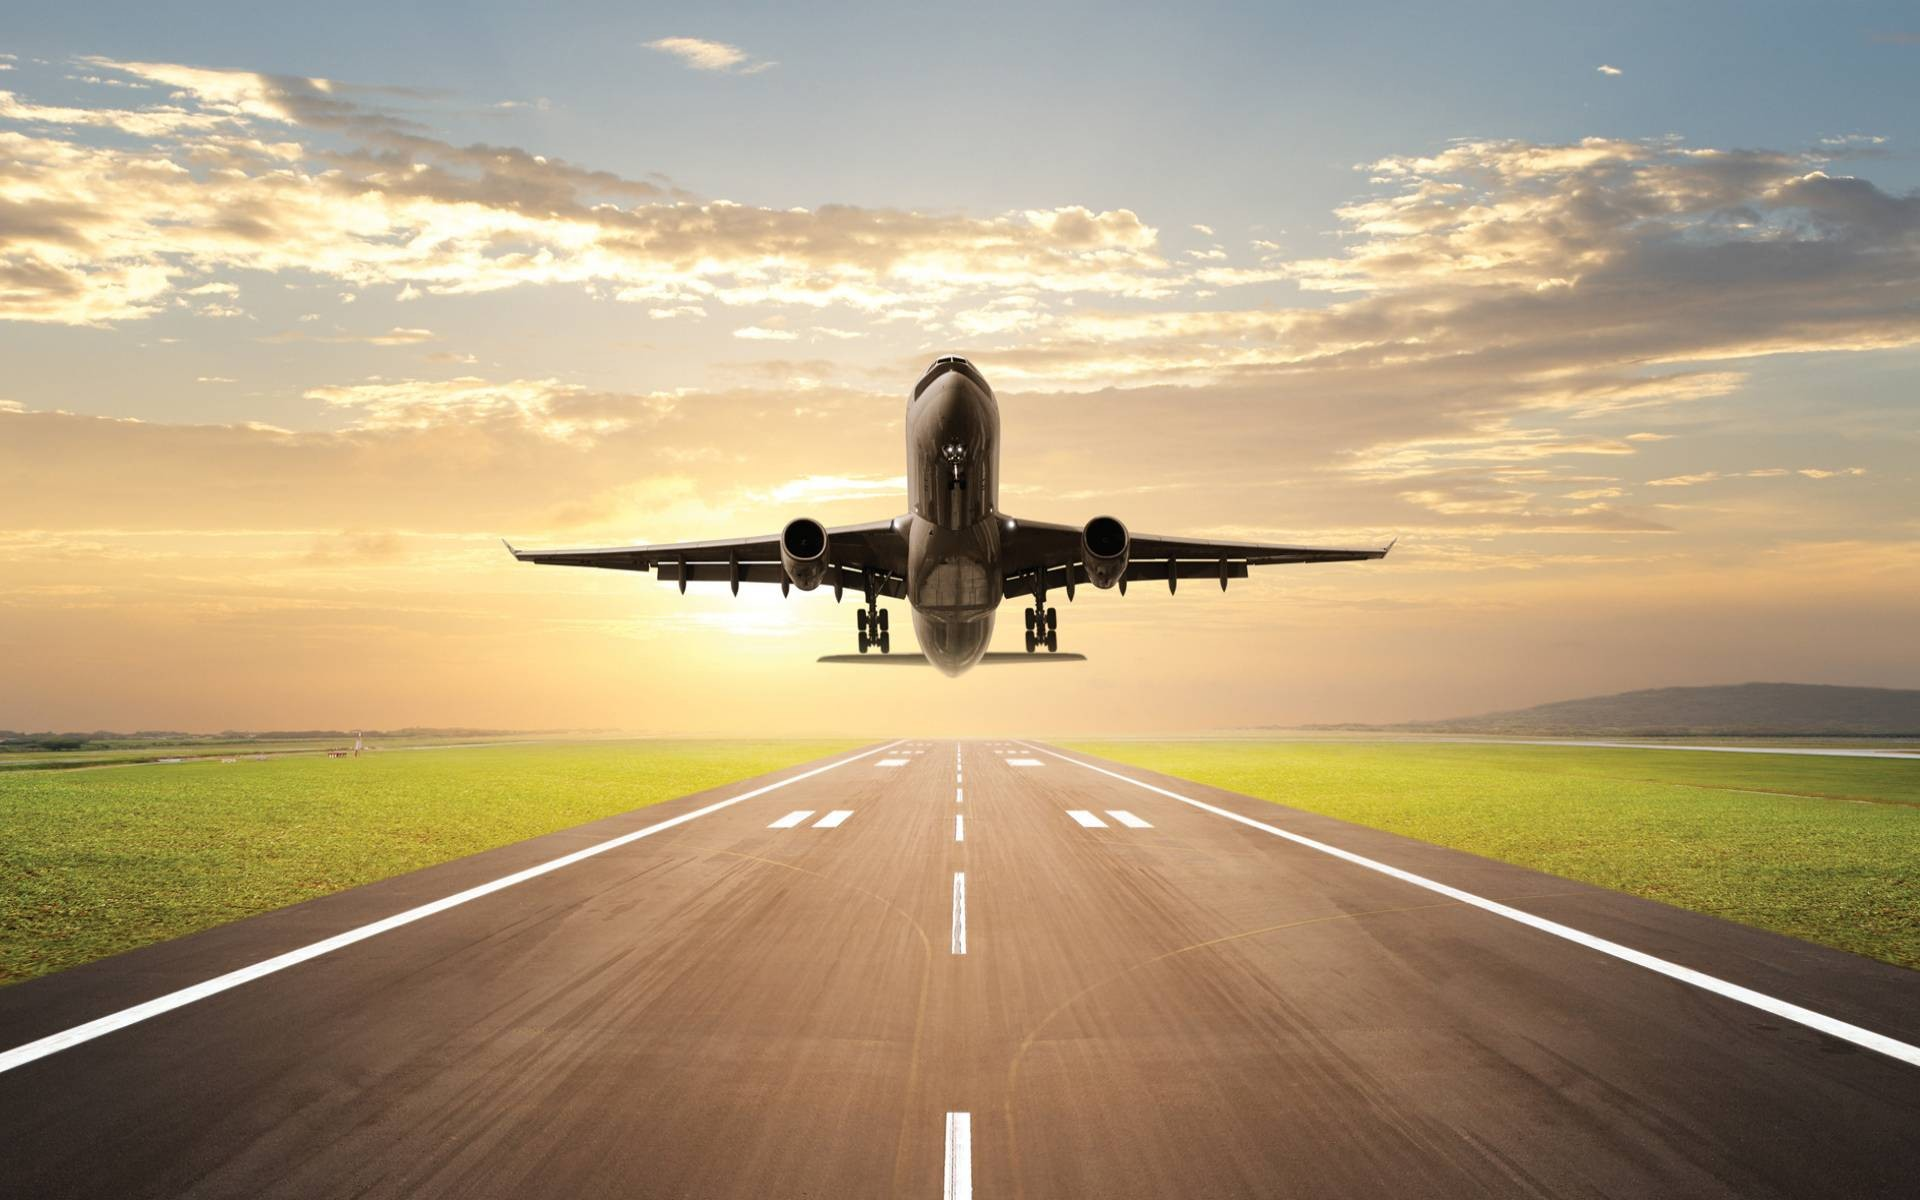 КНР  строит аэропорт награнице РФ